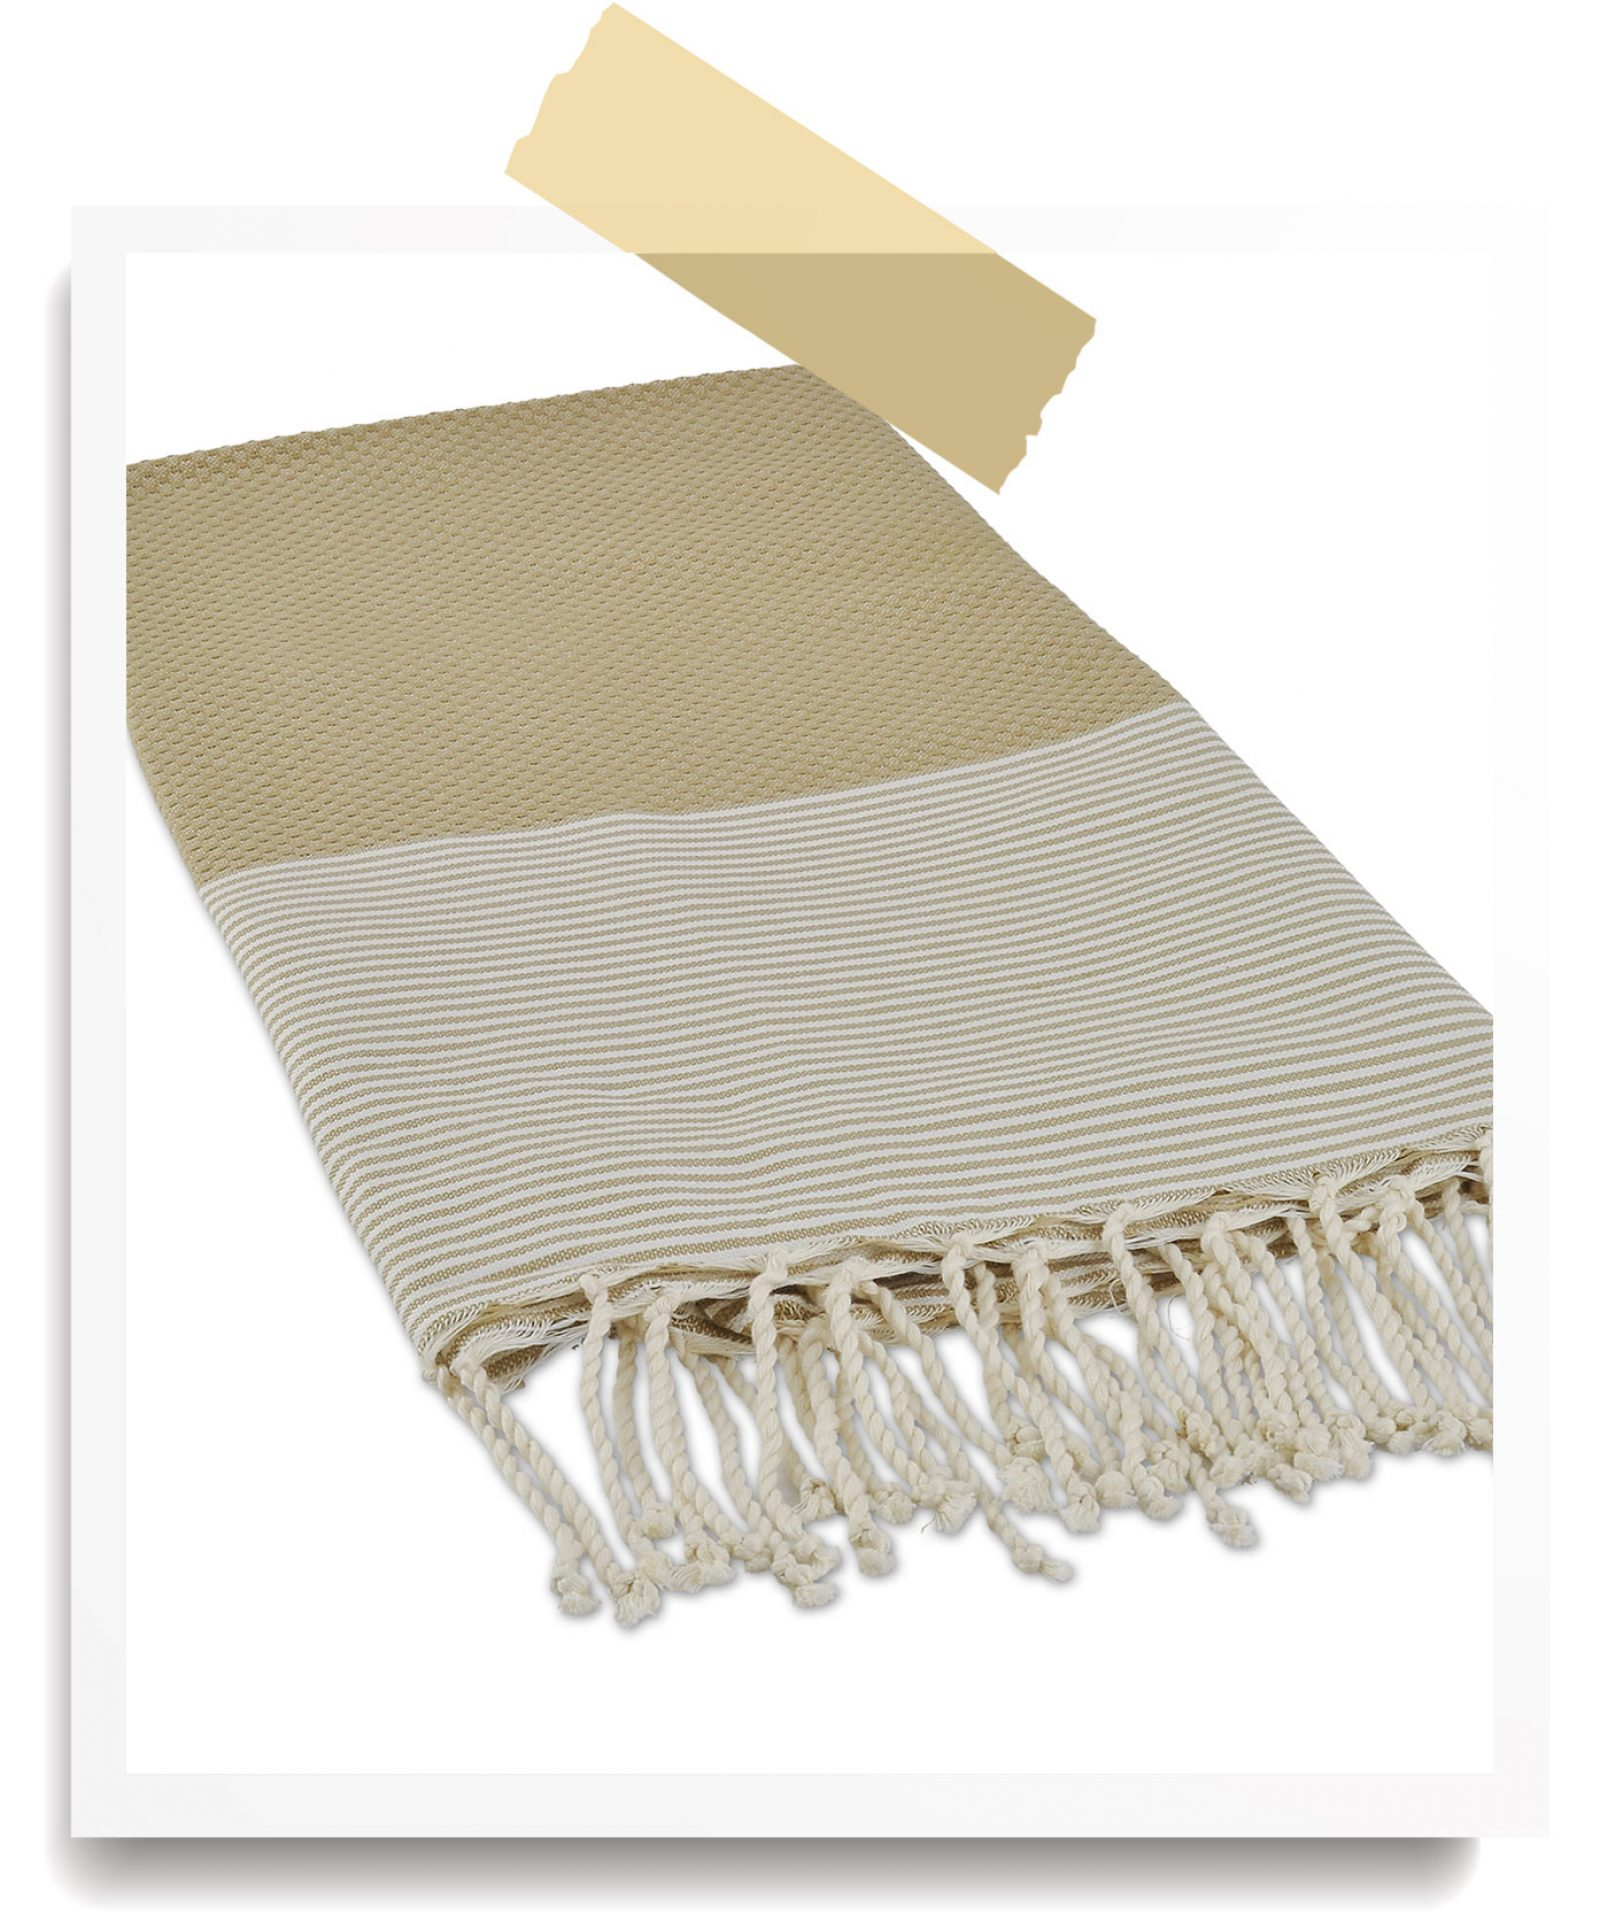 http://lookbook.allee-du-foulard.fr/wp-content/uploads/2018/06/0680-ADF-Accessoires-de-mode-LB-Soldes-Ete-fouta-beige-1600x1930.jpg